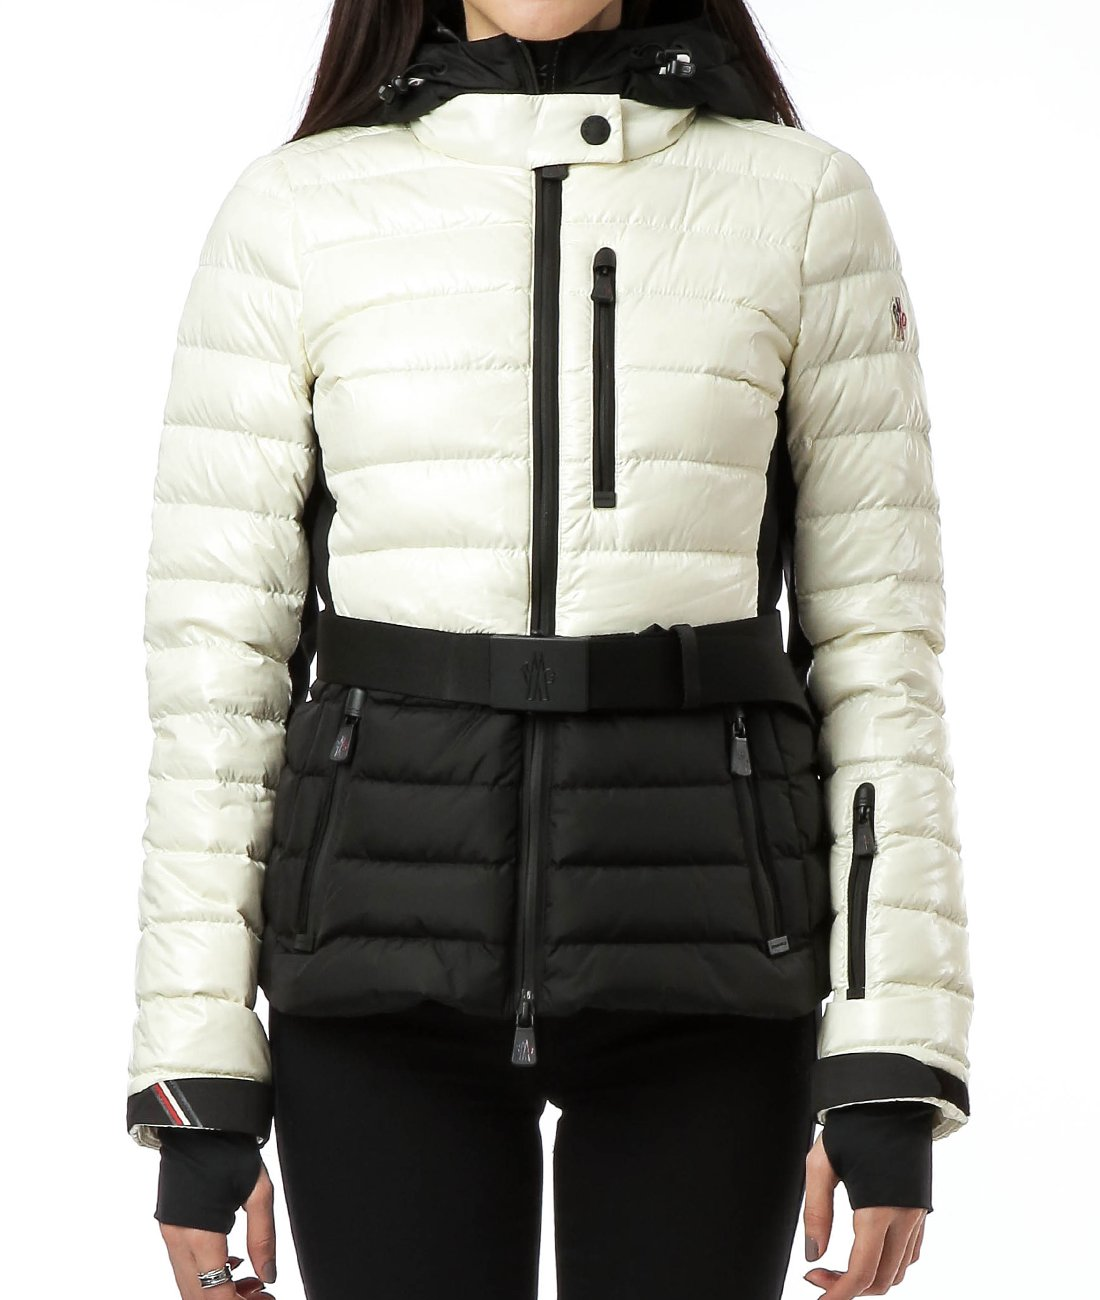 Wiberlux Moncler Bruche Women's Belt Detail Hooded Two-Tone Jacket 3 White